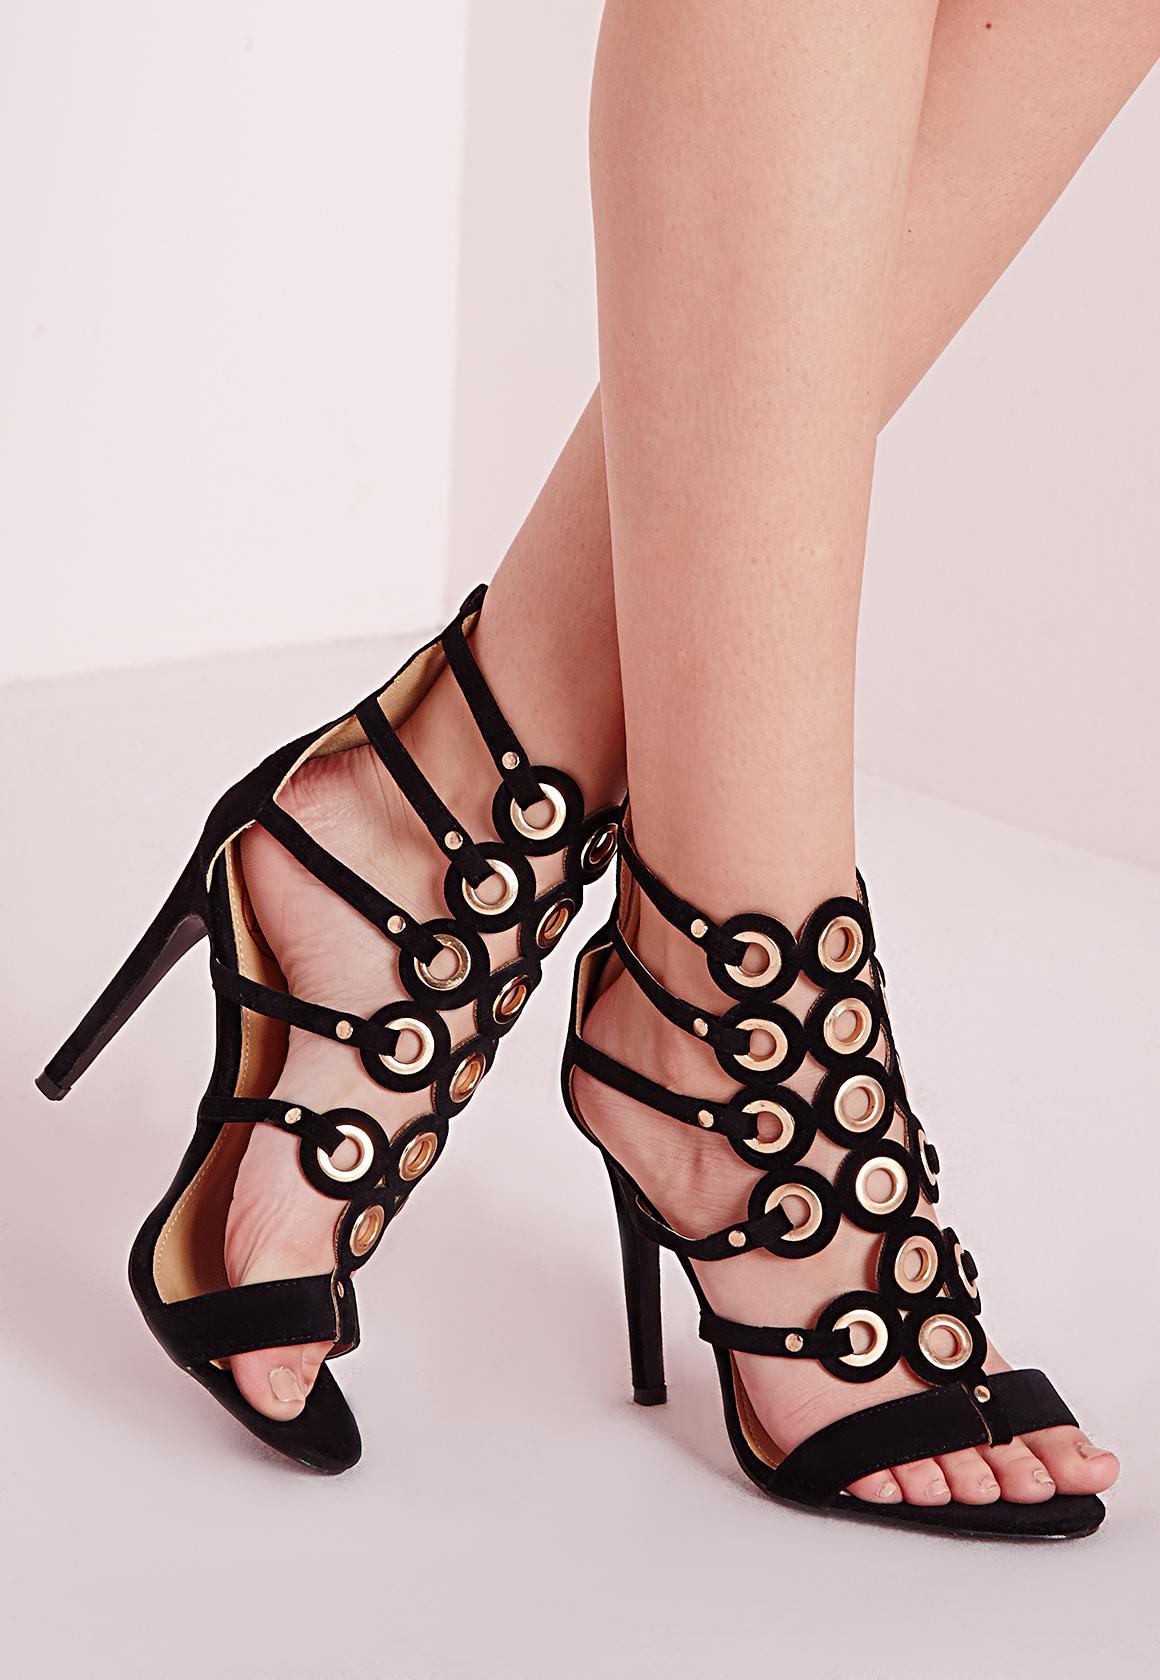 fa52d8b7303 Eyelet Detail Caged Heeled Gladiator Sandals Black